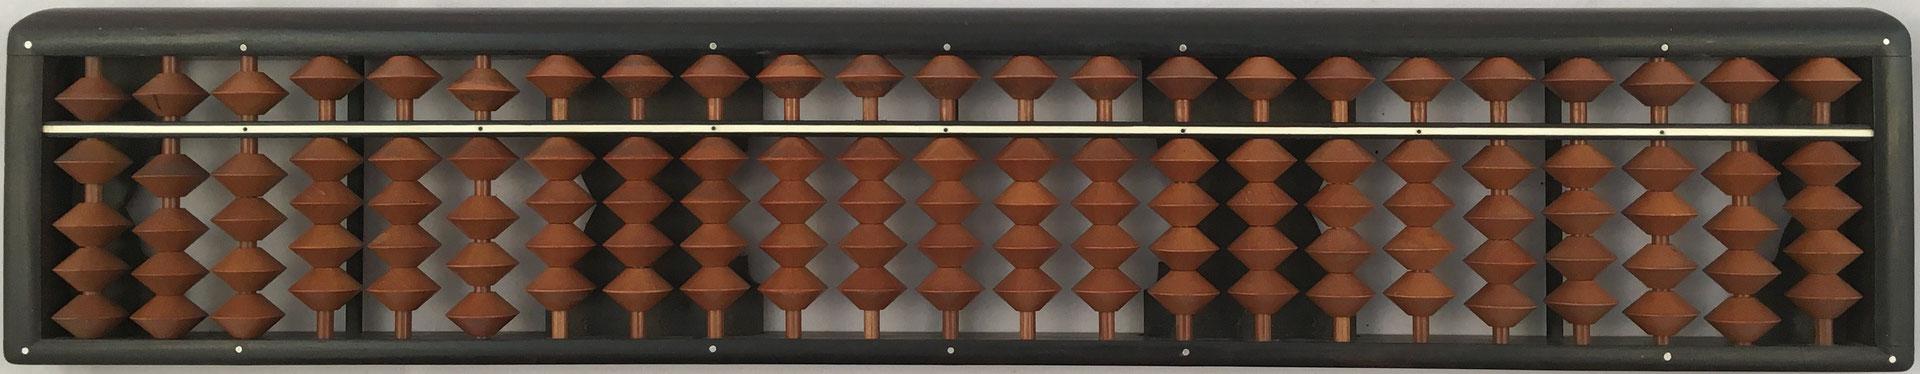 "Ábaco japonés ""soroban"" posterior a la II Guerra Mundial, 23 columnas, 33x6 cm"